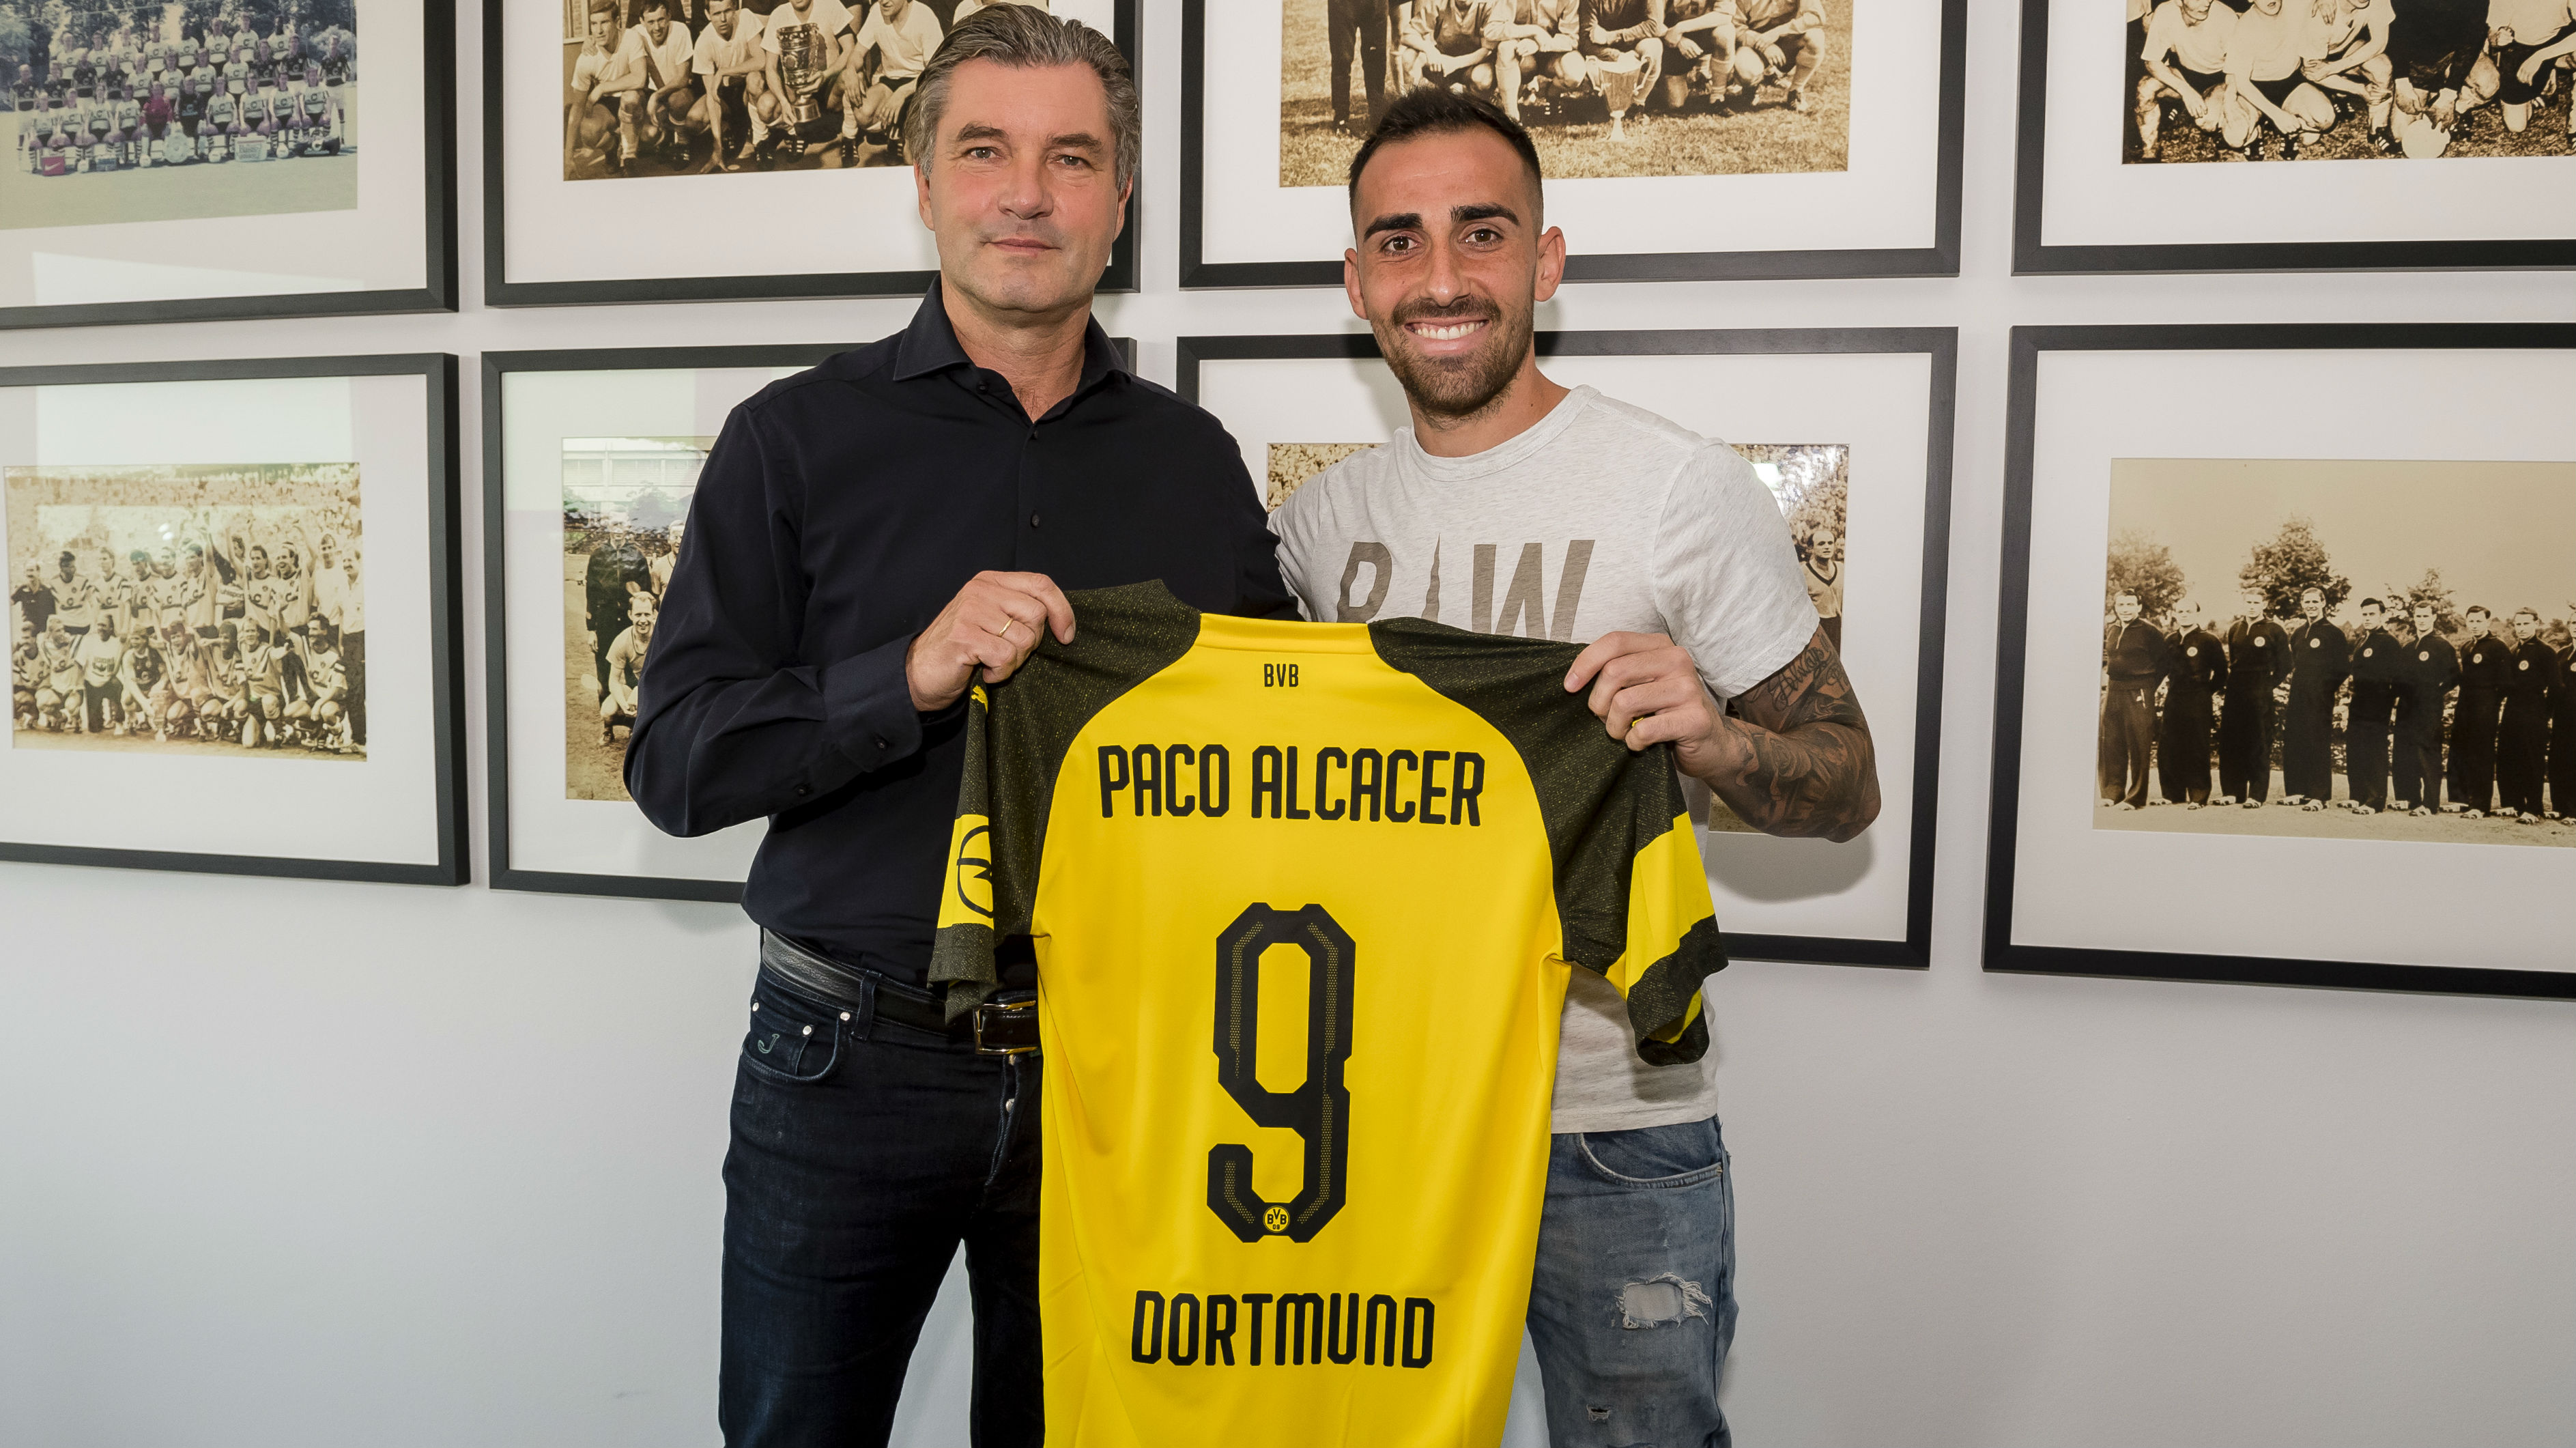 Barcelona transfer news: Borussia Dortmund sign Paco Alcacer on ...